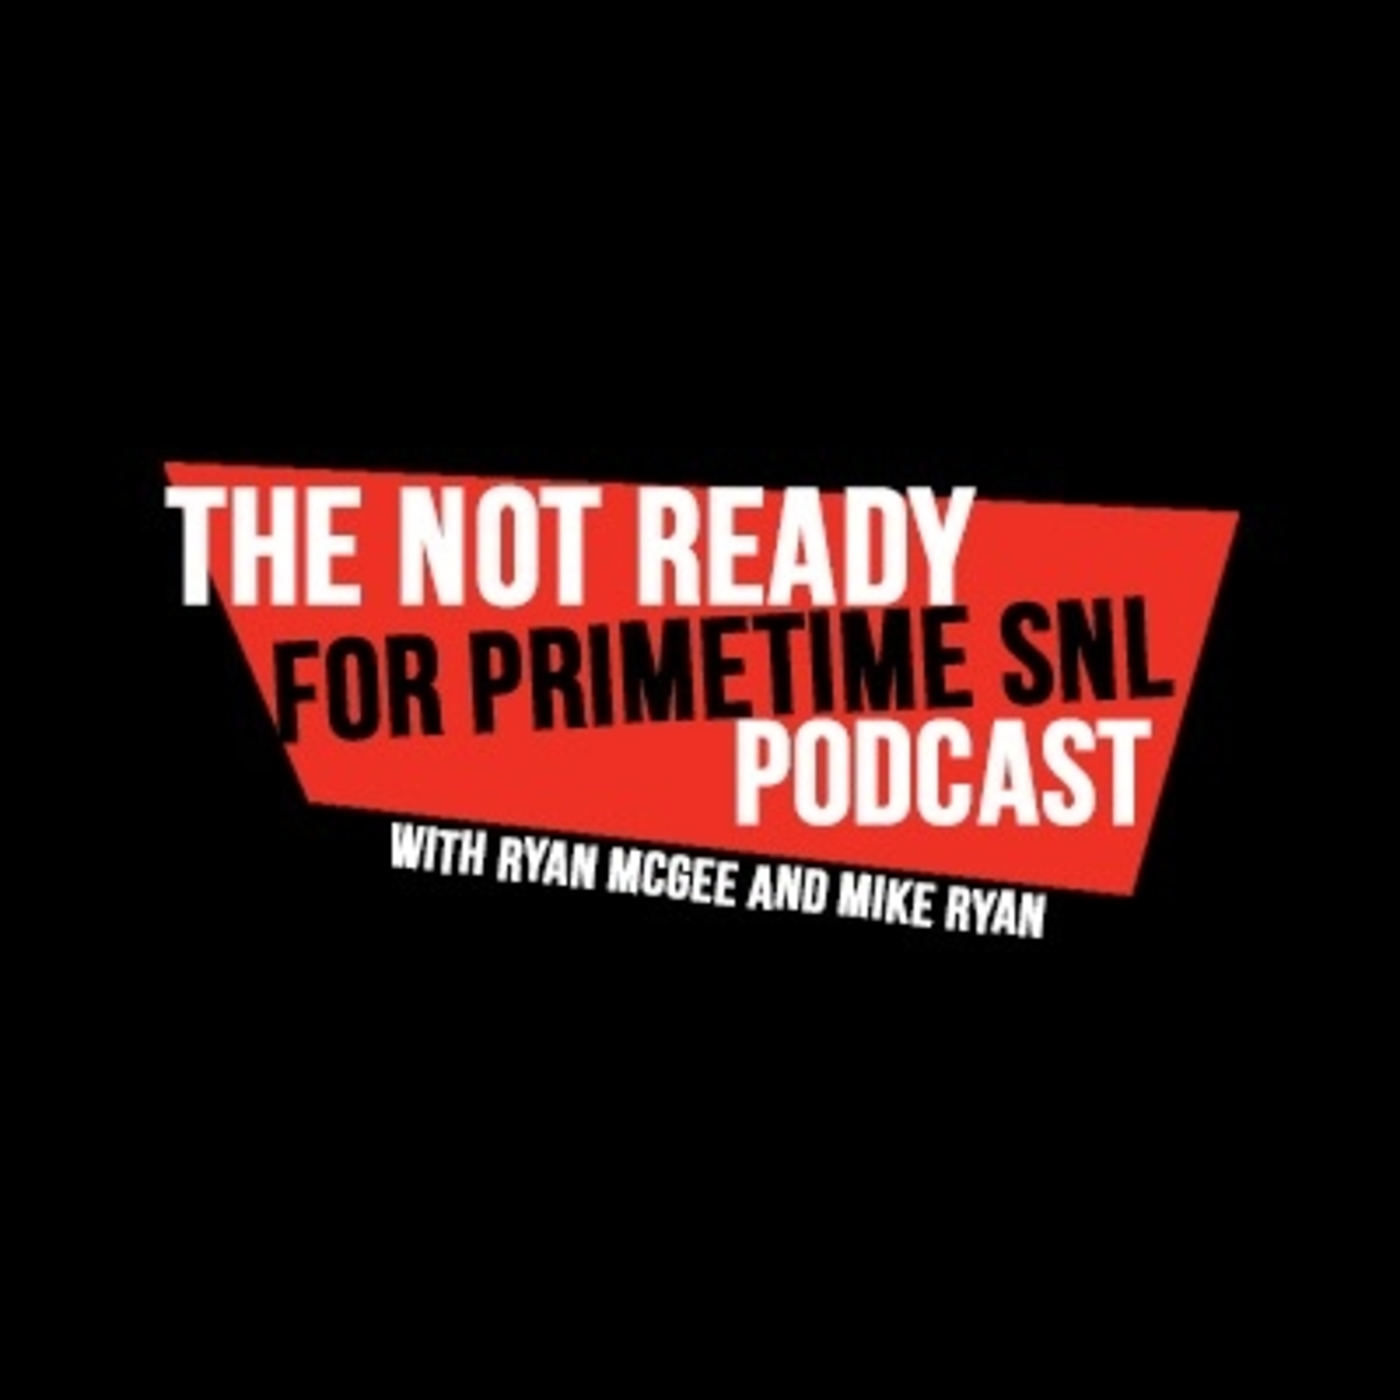 The Not Ready For Primetime SNL Podcast show art